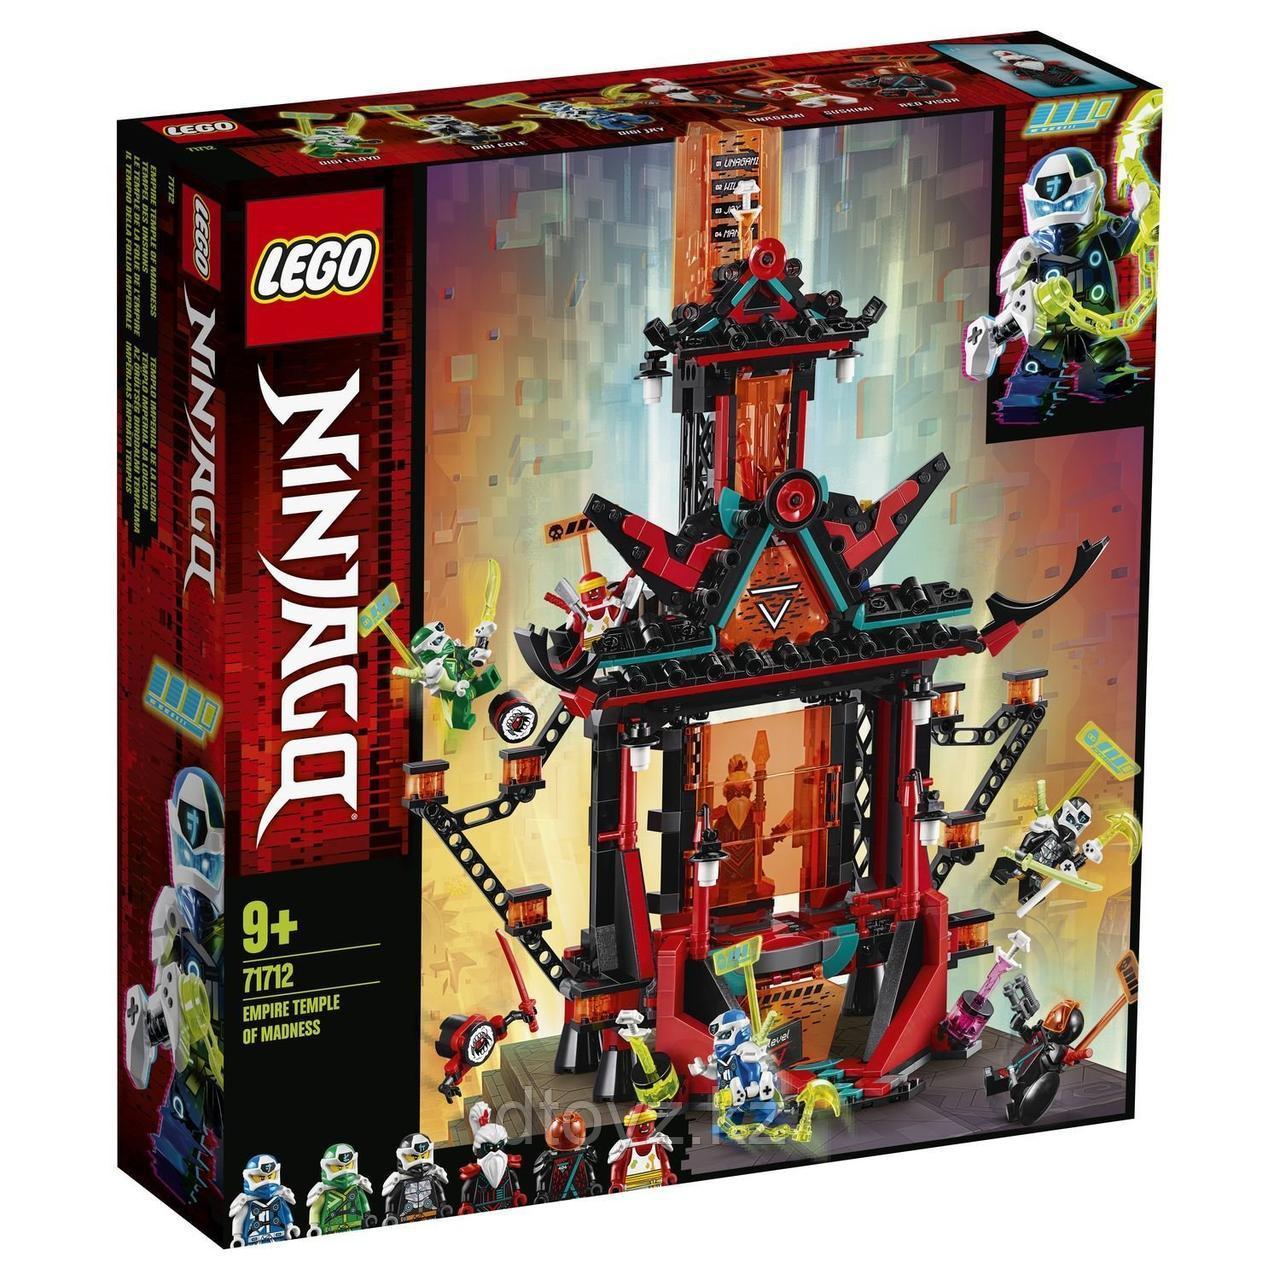 Lego Ninjago 71712 Императорский храм Безумия